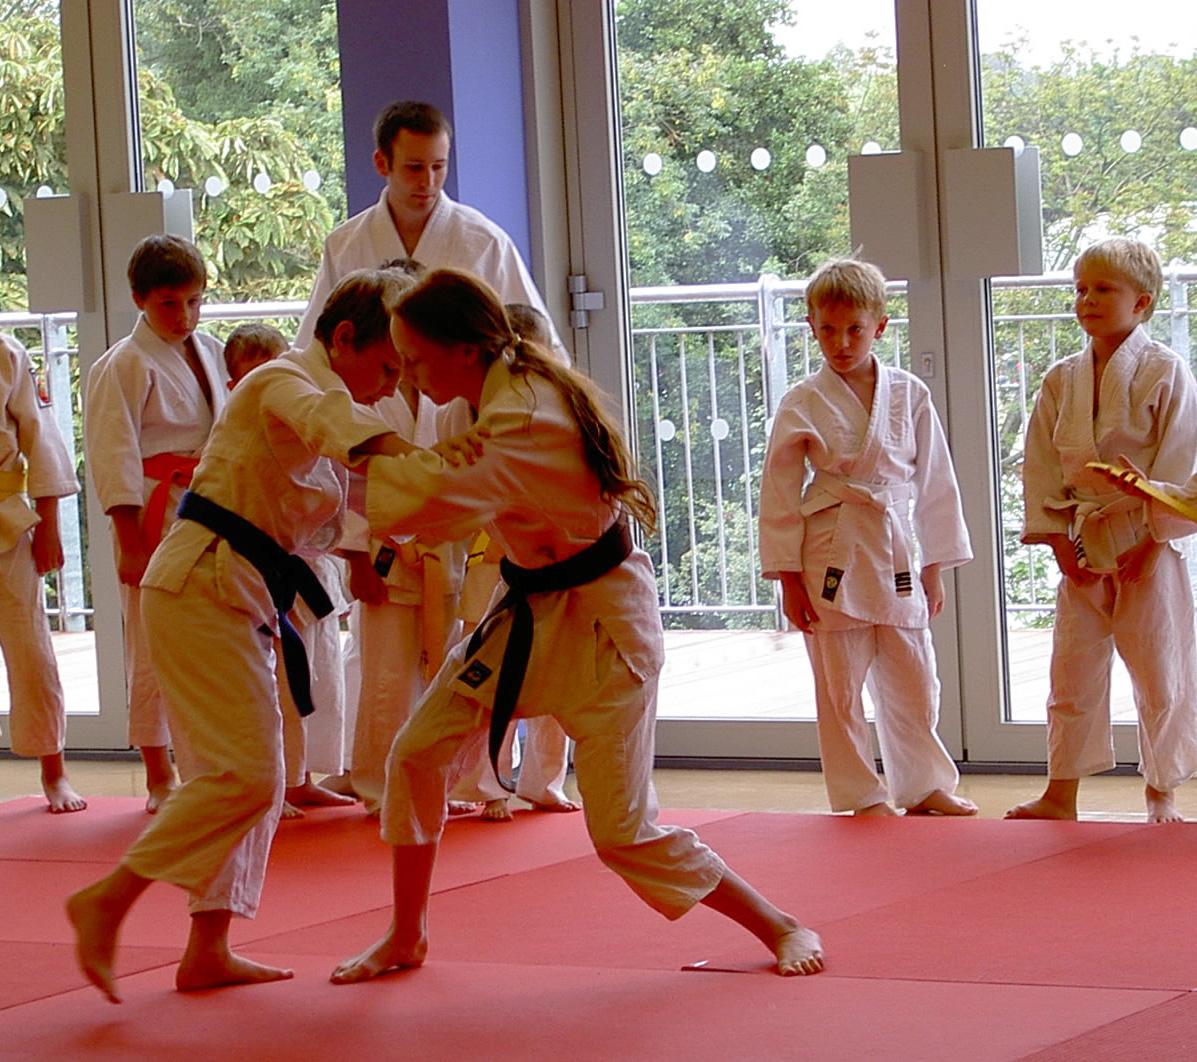 Judo-Classes-at-Elmbridge-Xcel-Walton-on-Thames-a copy.jpg